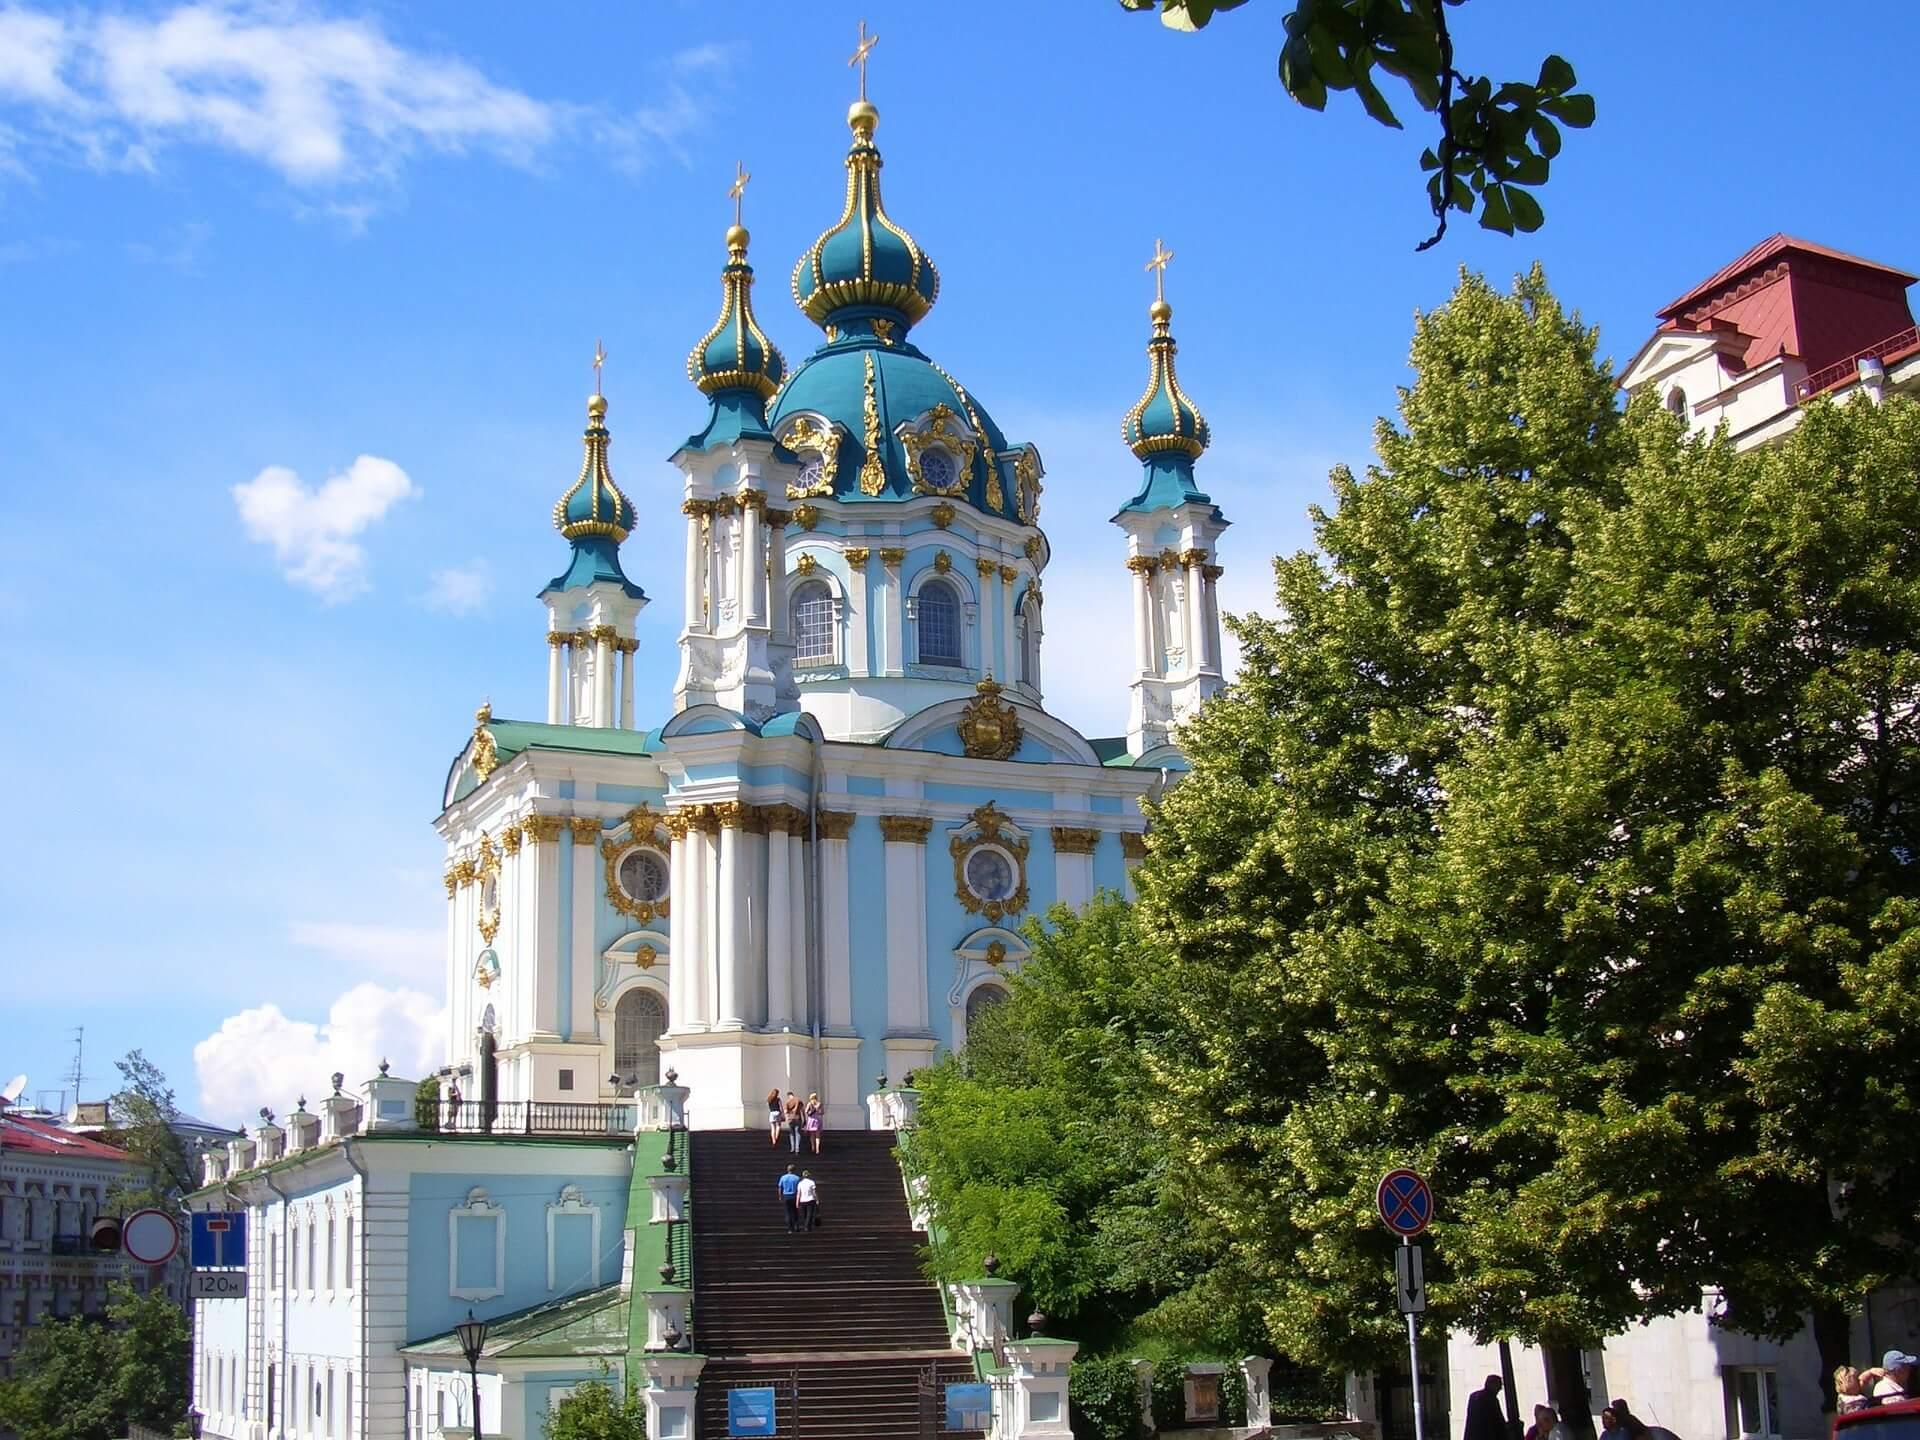 Direktflüge und Billigflüge ab Nürnberg nach Kiev Boryspil